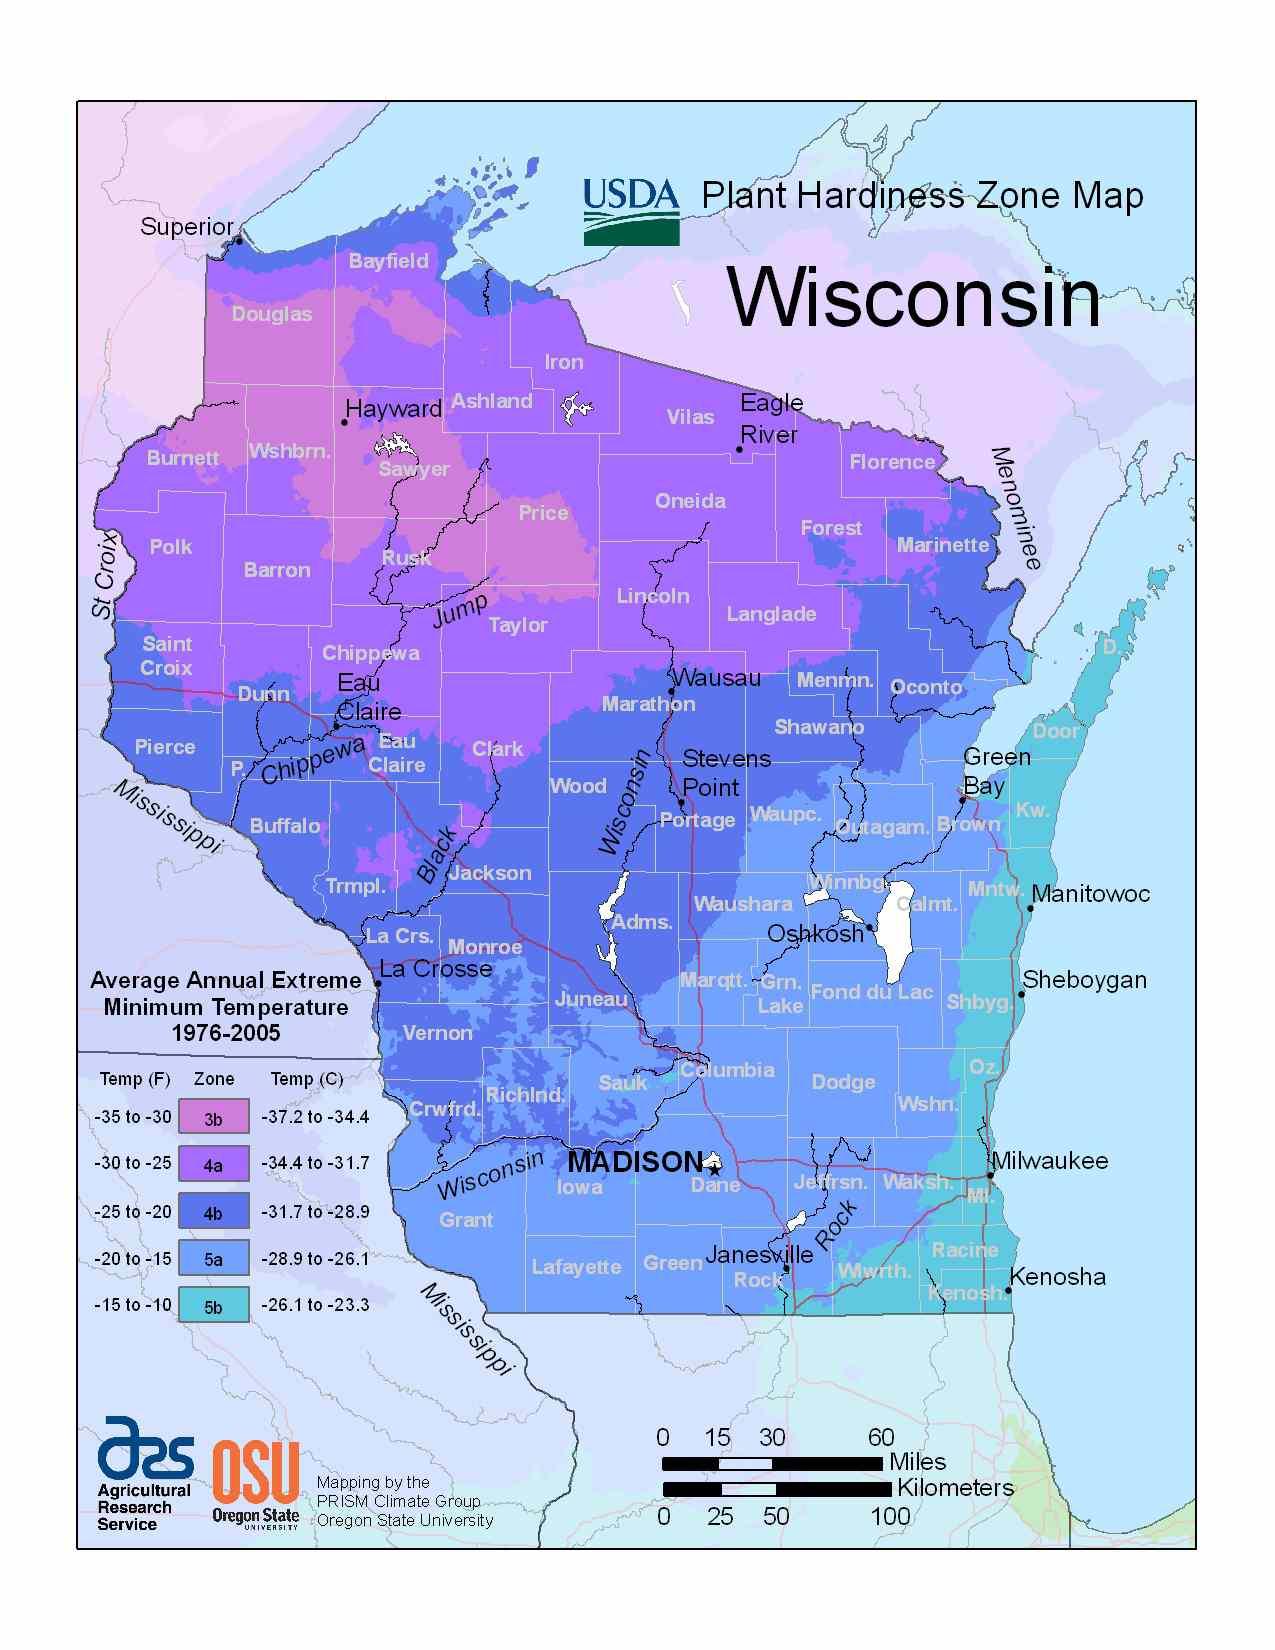 Photo of the Wisconsin Hardiness Zones